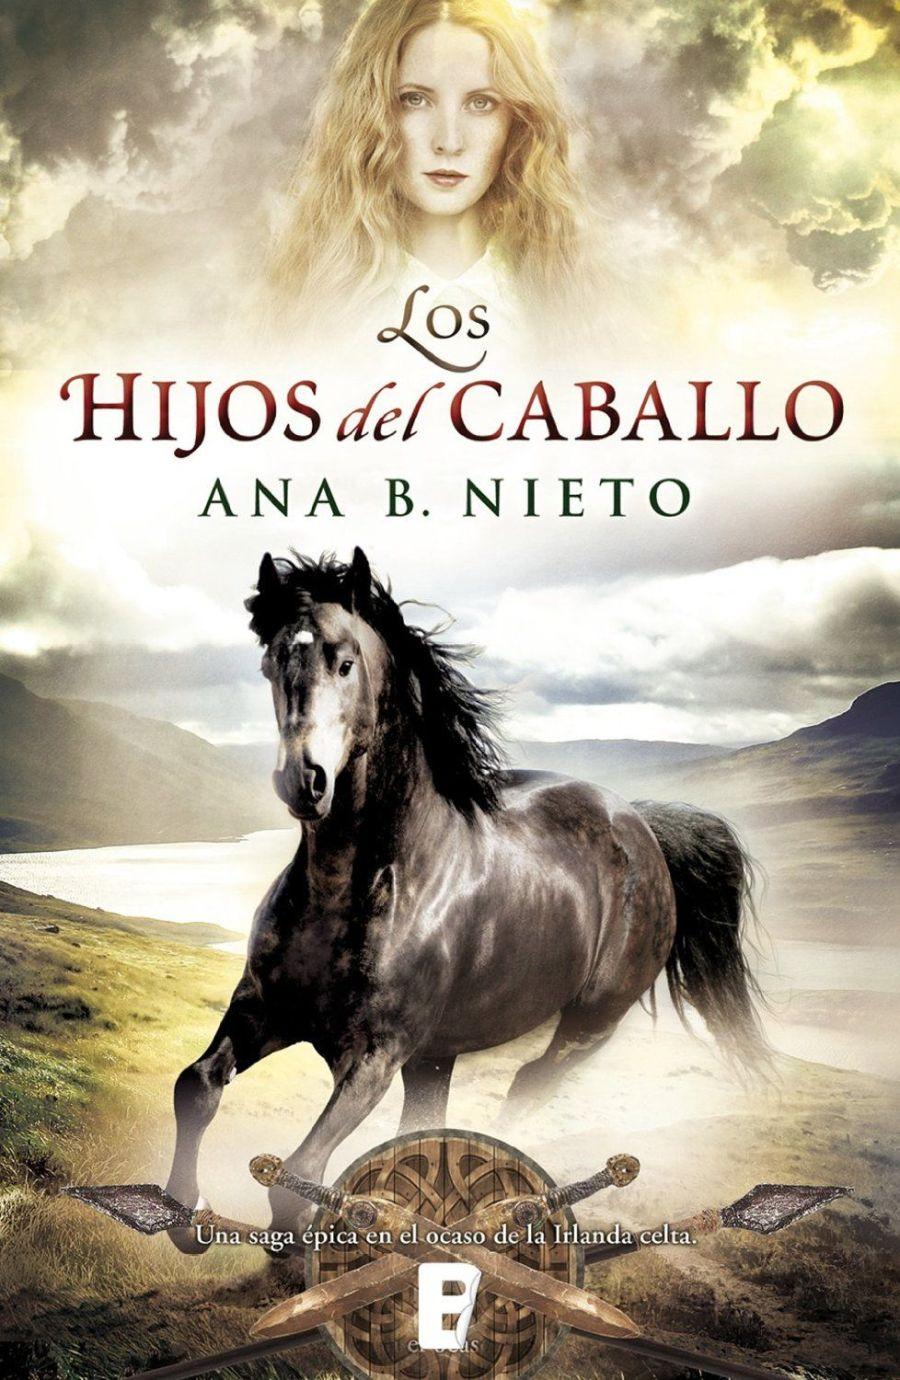 Los hijos del caballo Book Cover